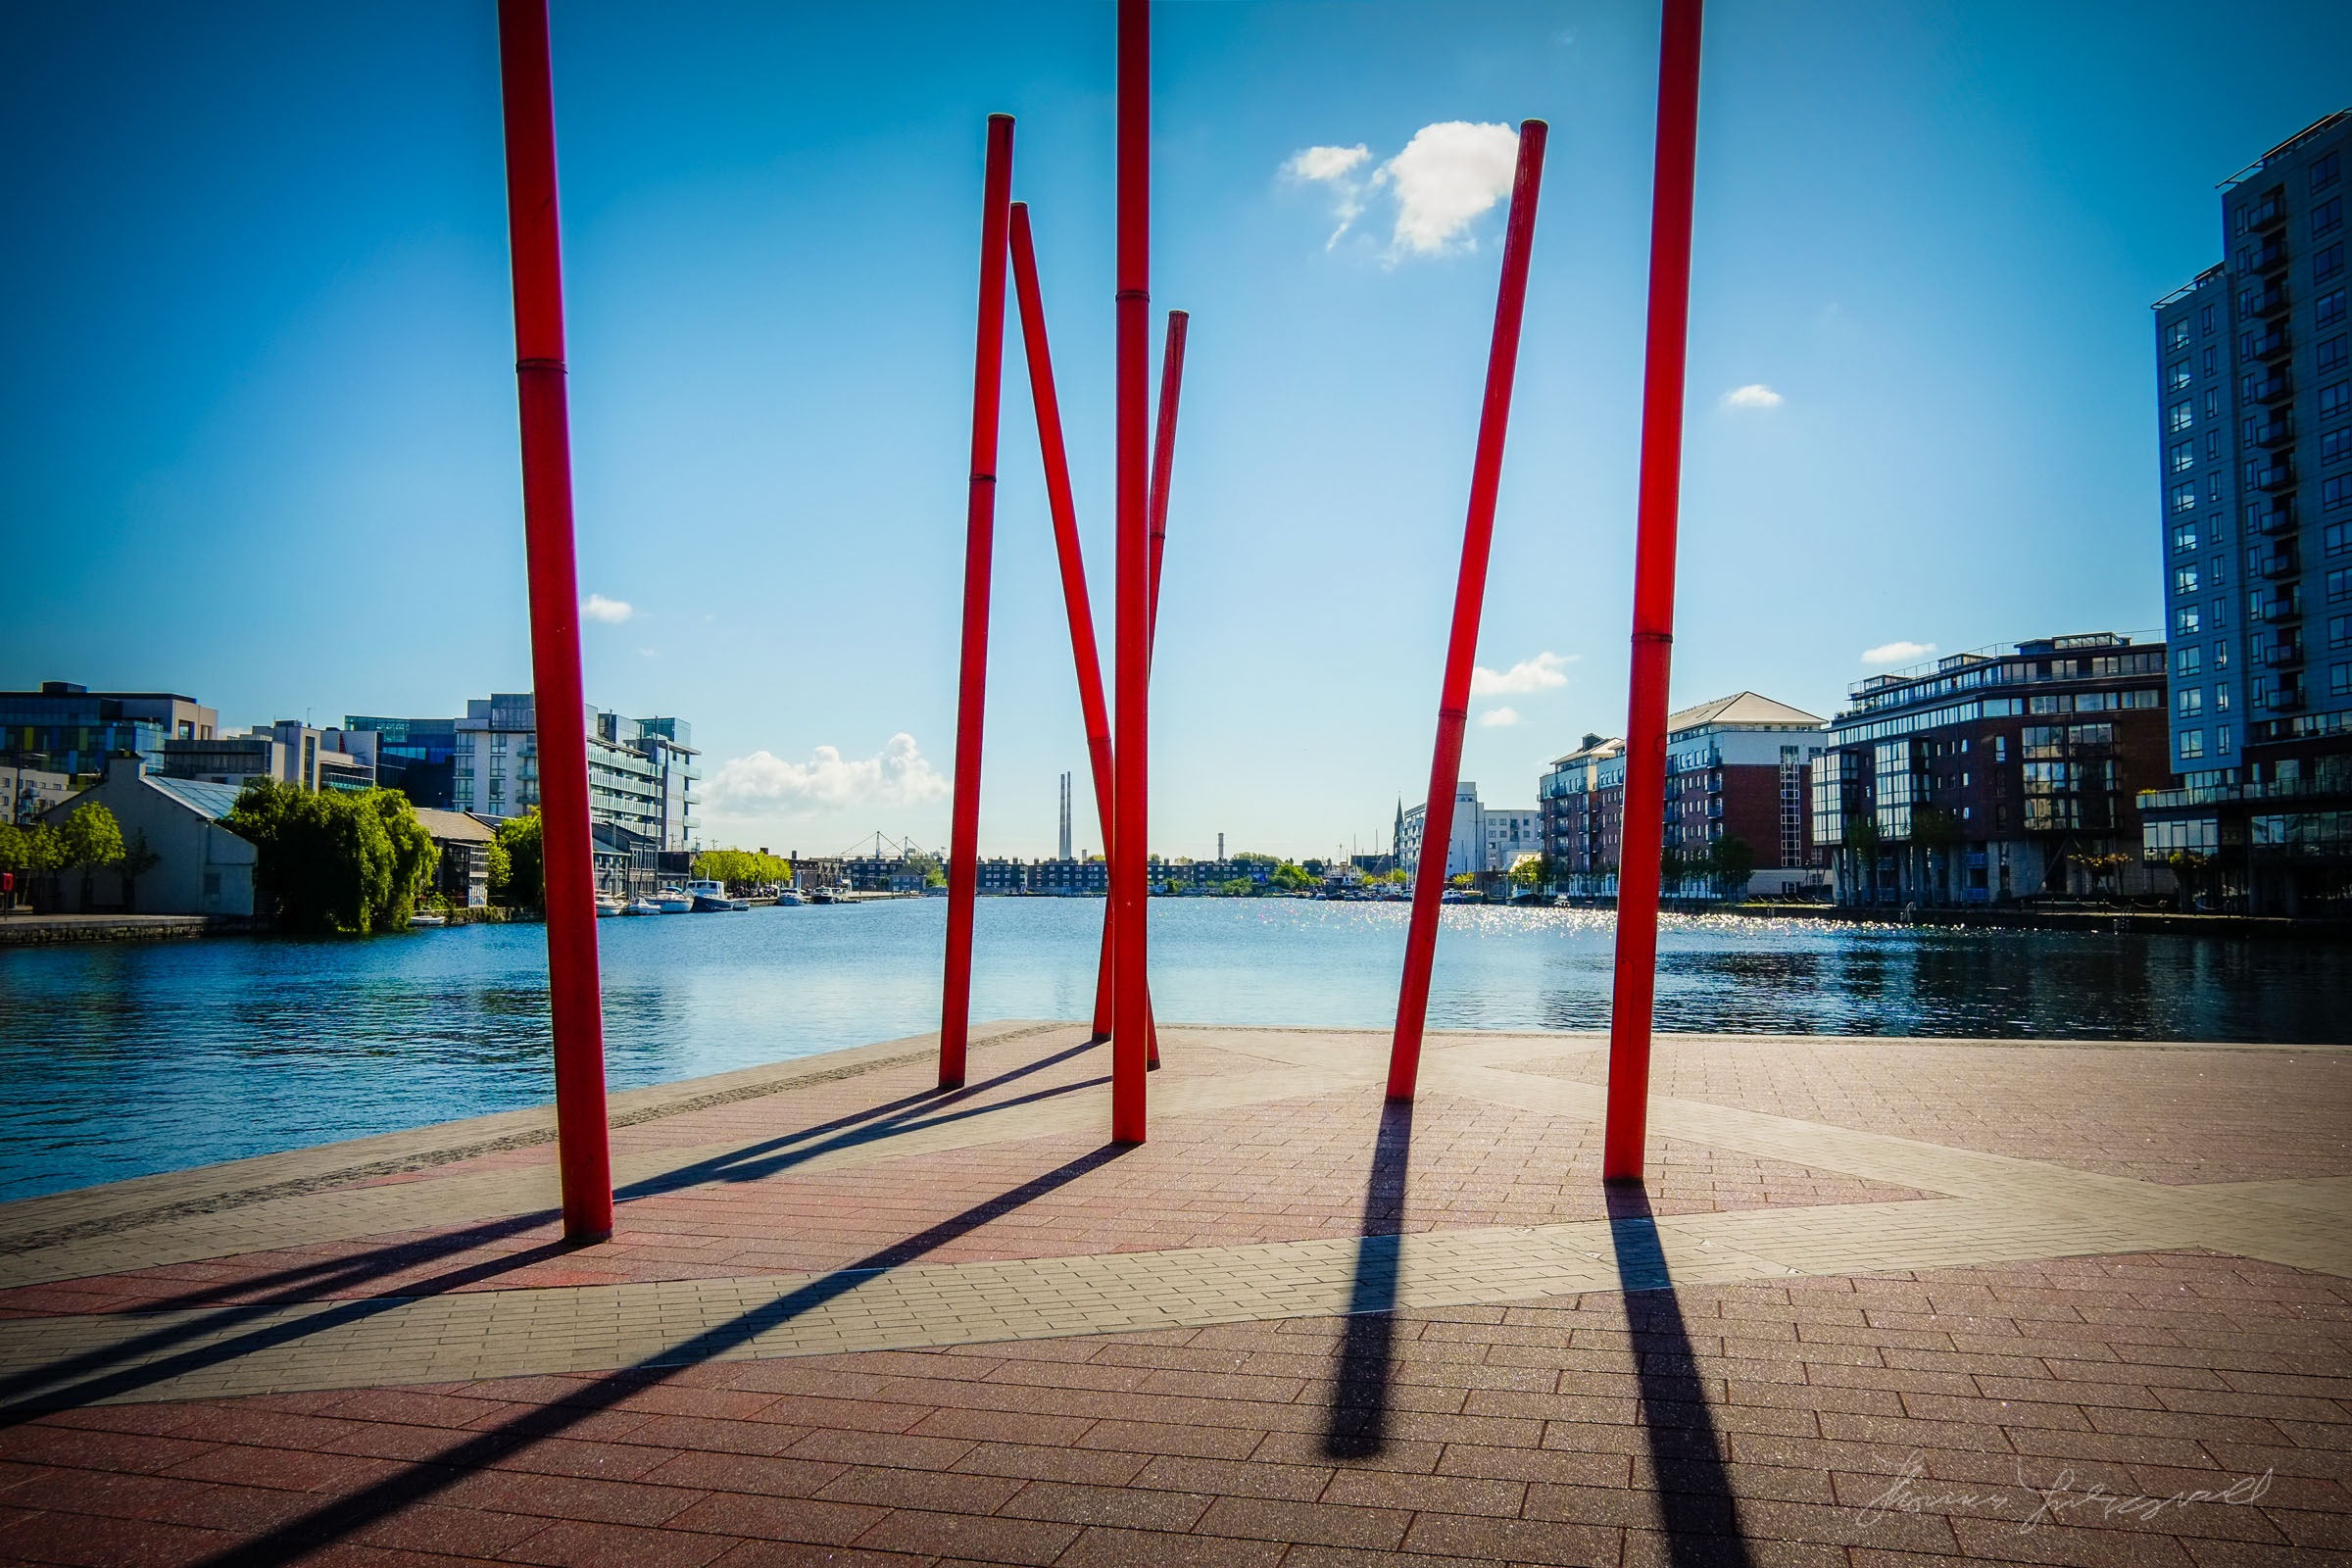 Streets-of-Dublin-Photo-1306.jpg